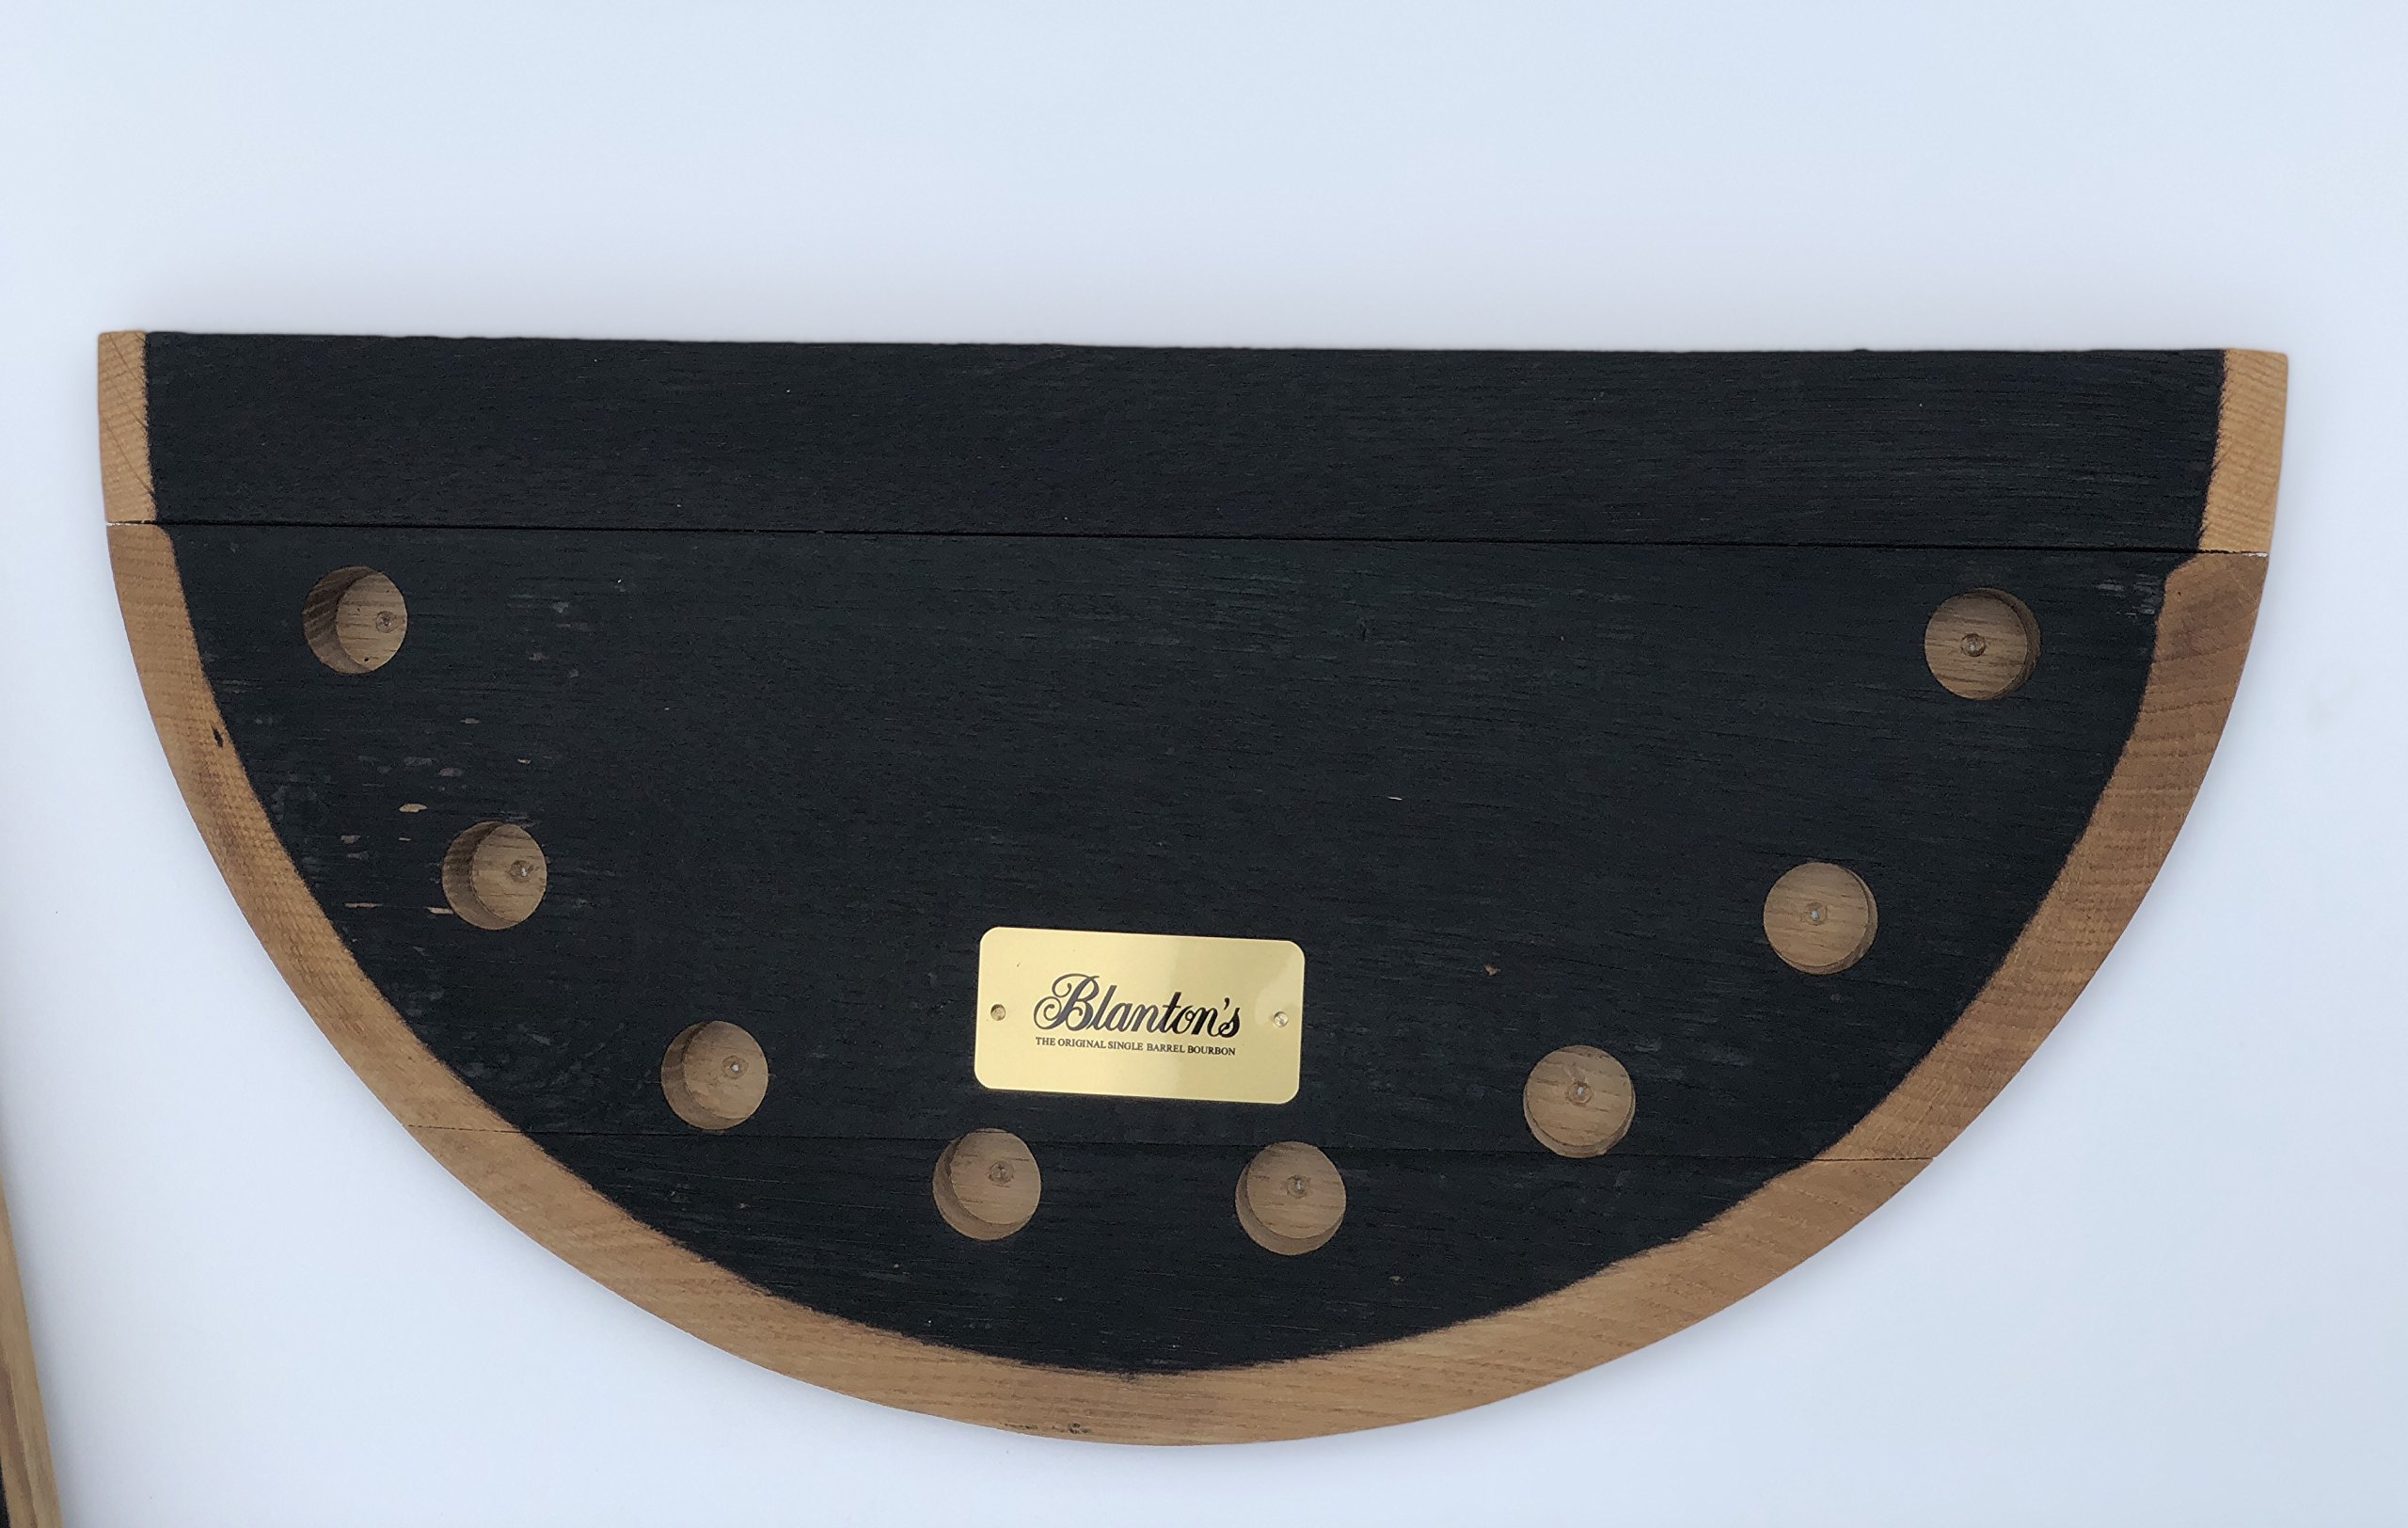 Blanton's Bourbon Half Barrel Head Stopper Display by Blanton's